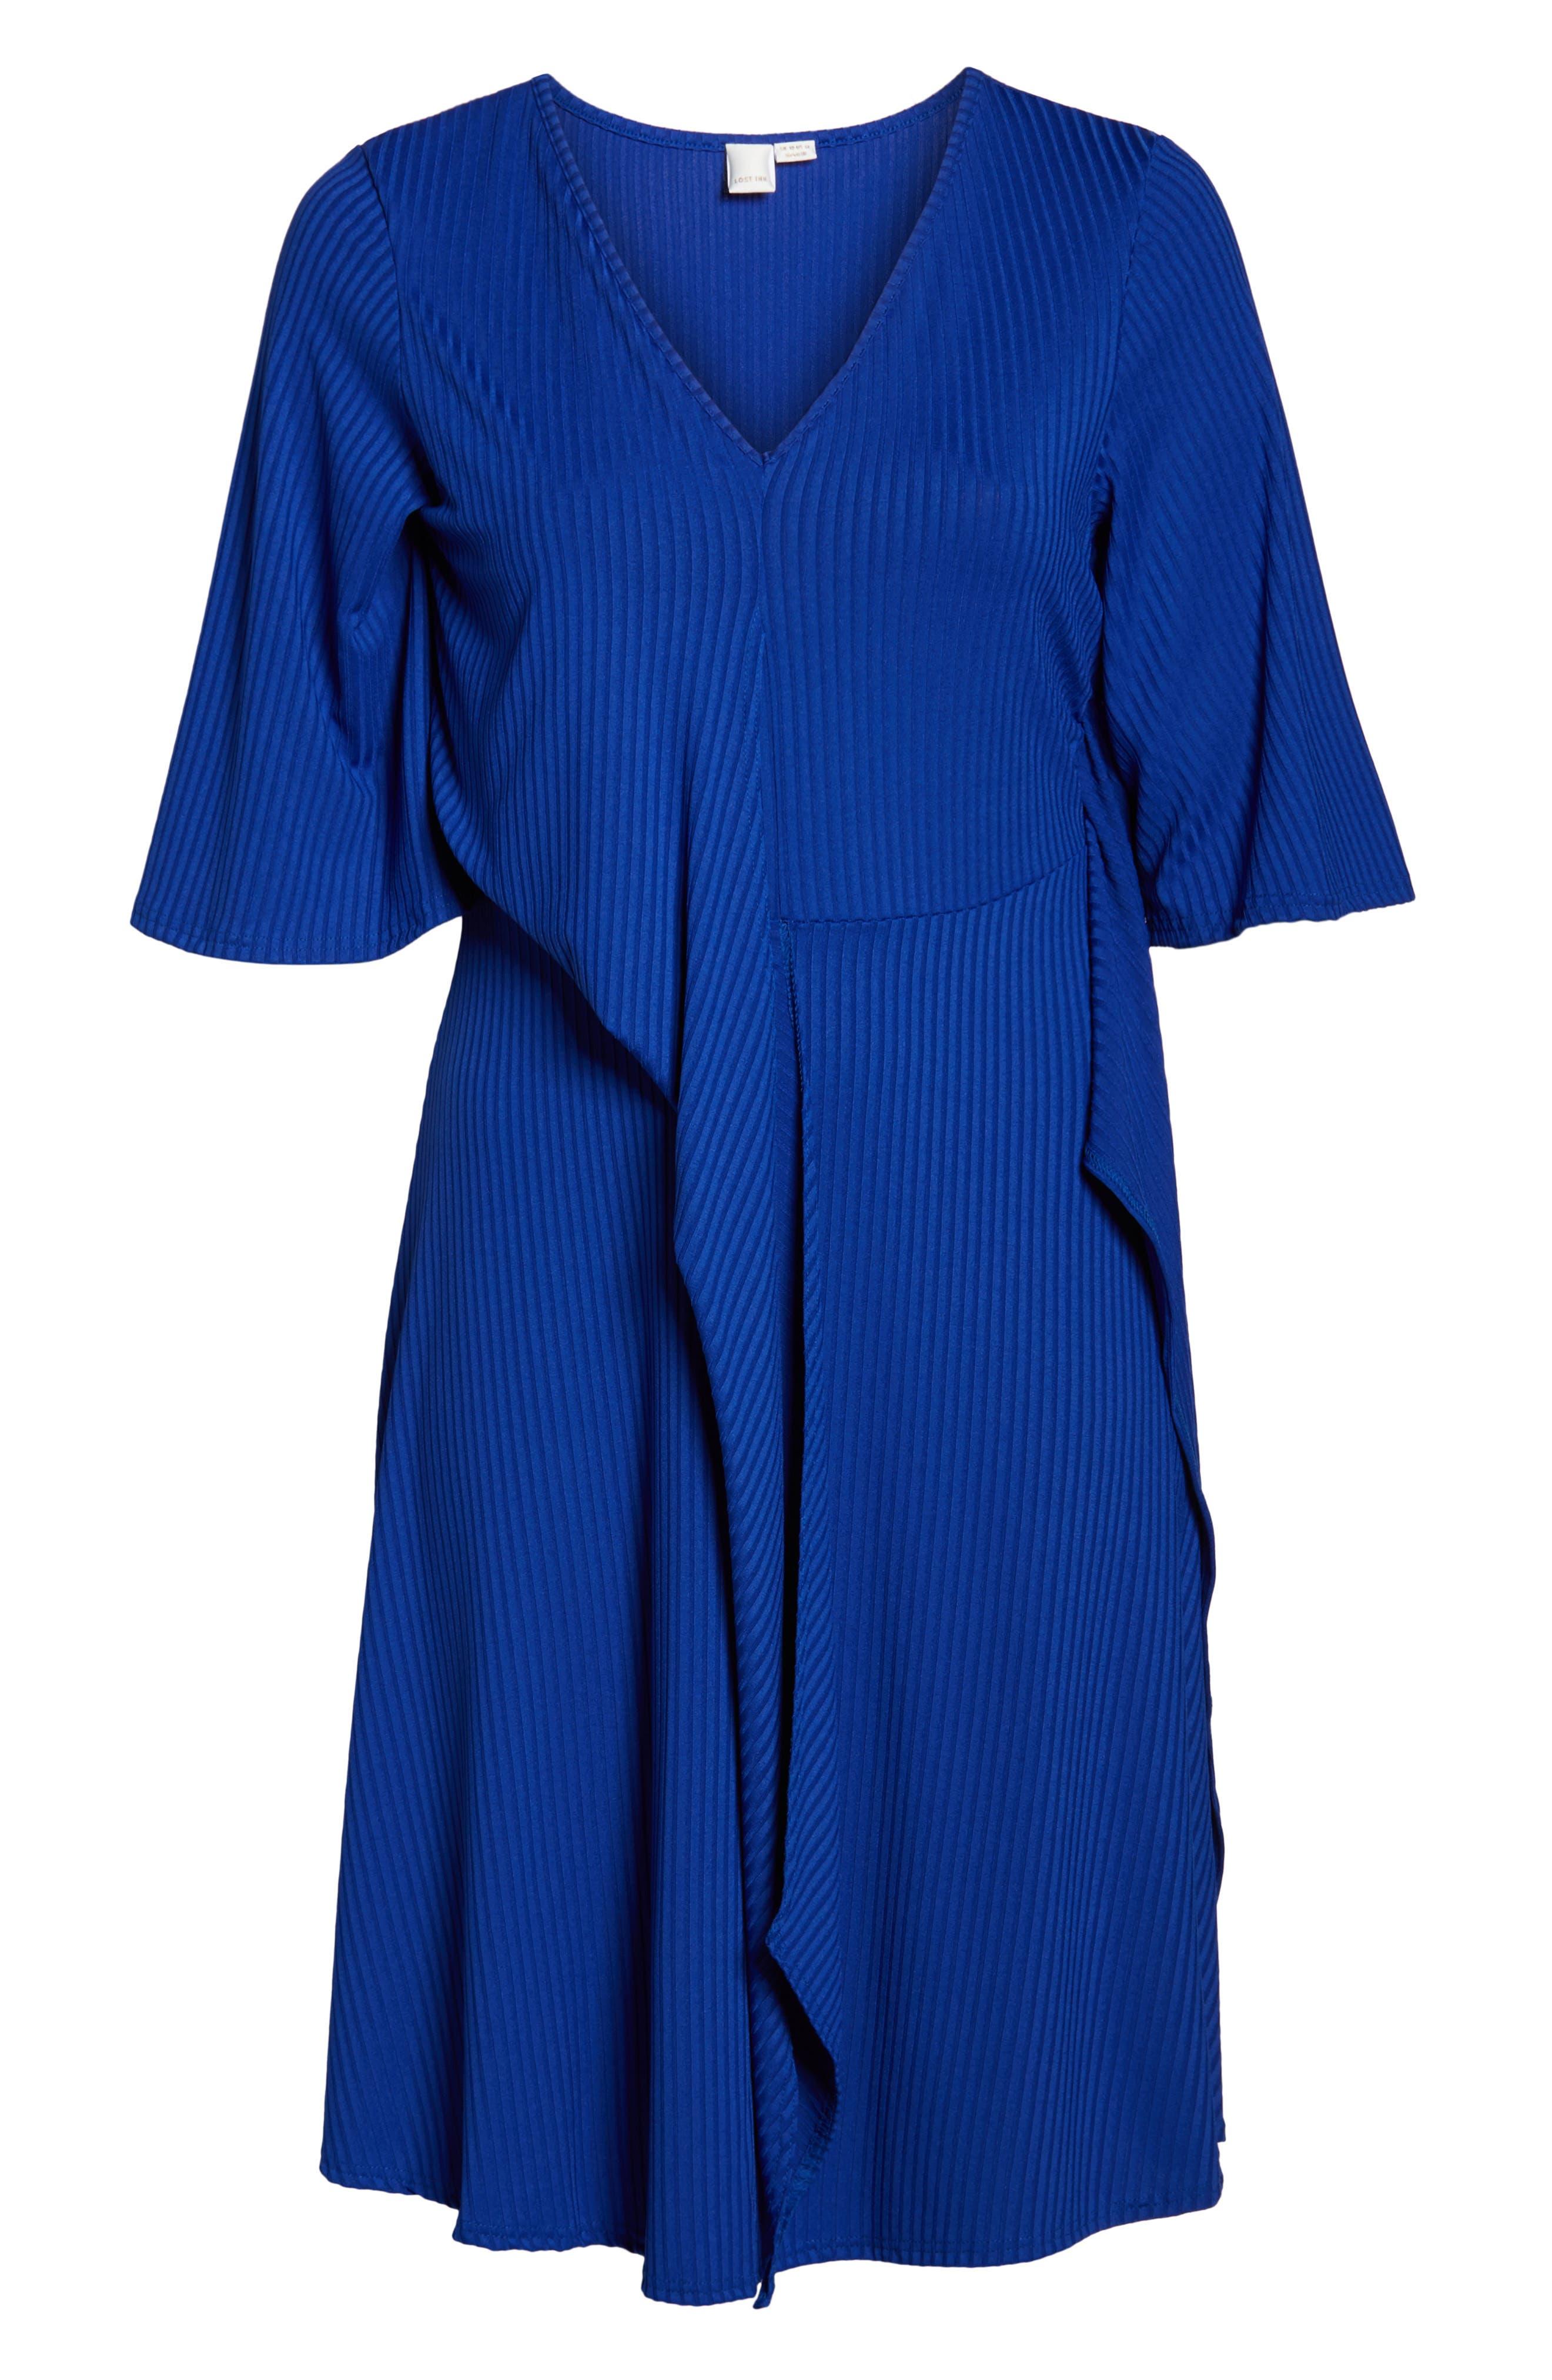 Ribbed Knit Skater Dress,                             Alternate thumbnail 7, color,                             BLUE